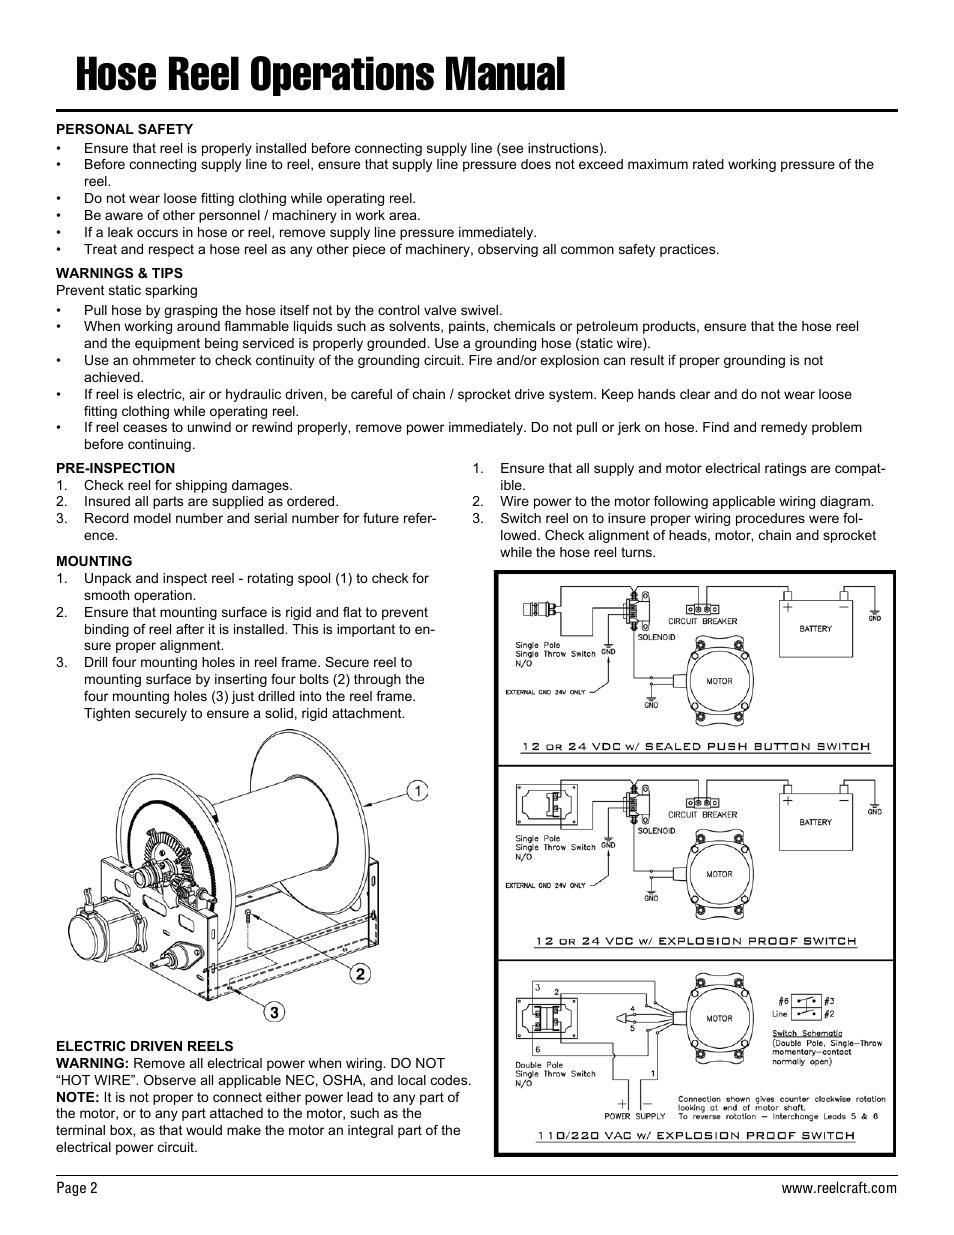 hose reel operations manual reelcraft nordic series 2400. Black Bedroom Furniture Sets. Home Design Ideas